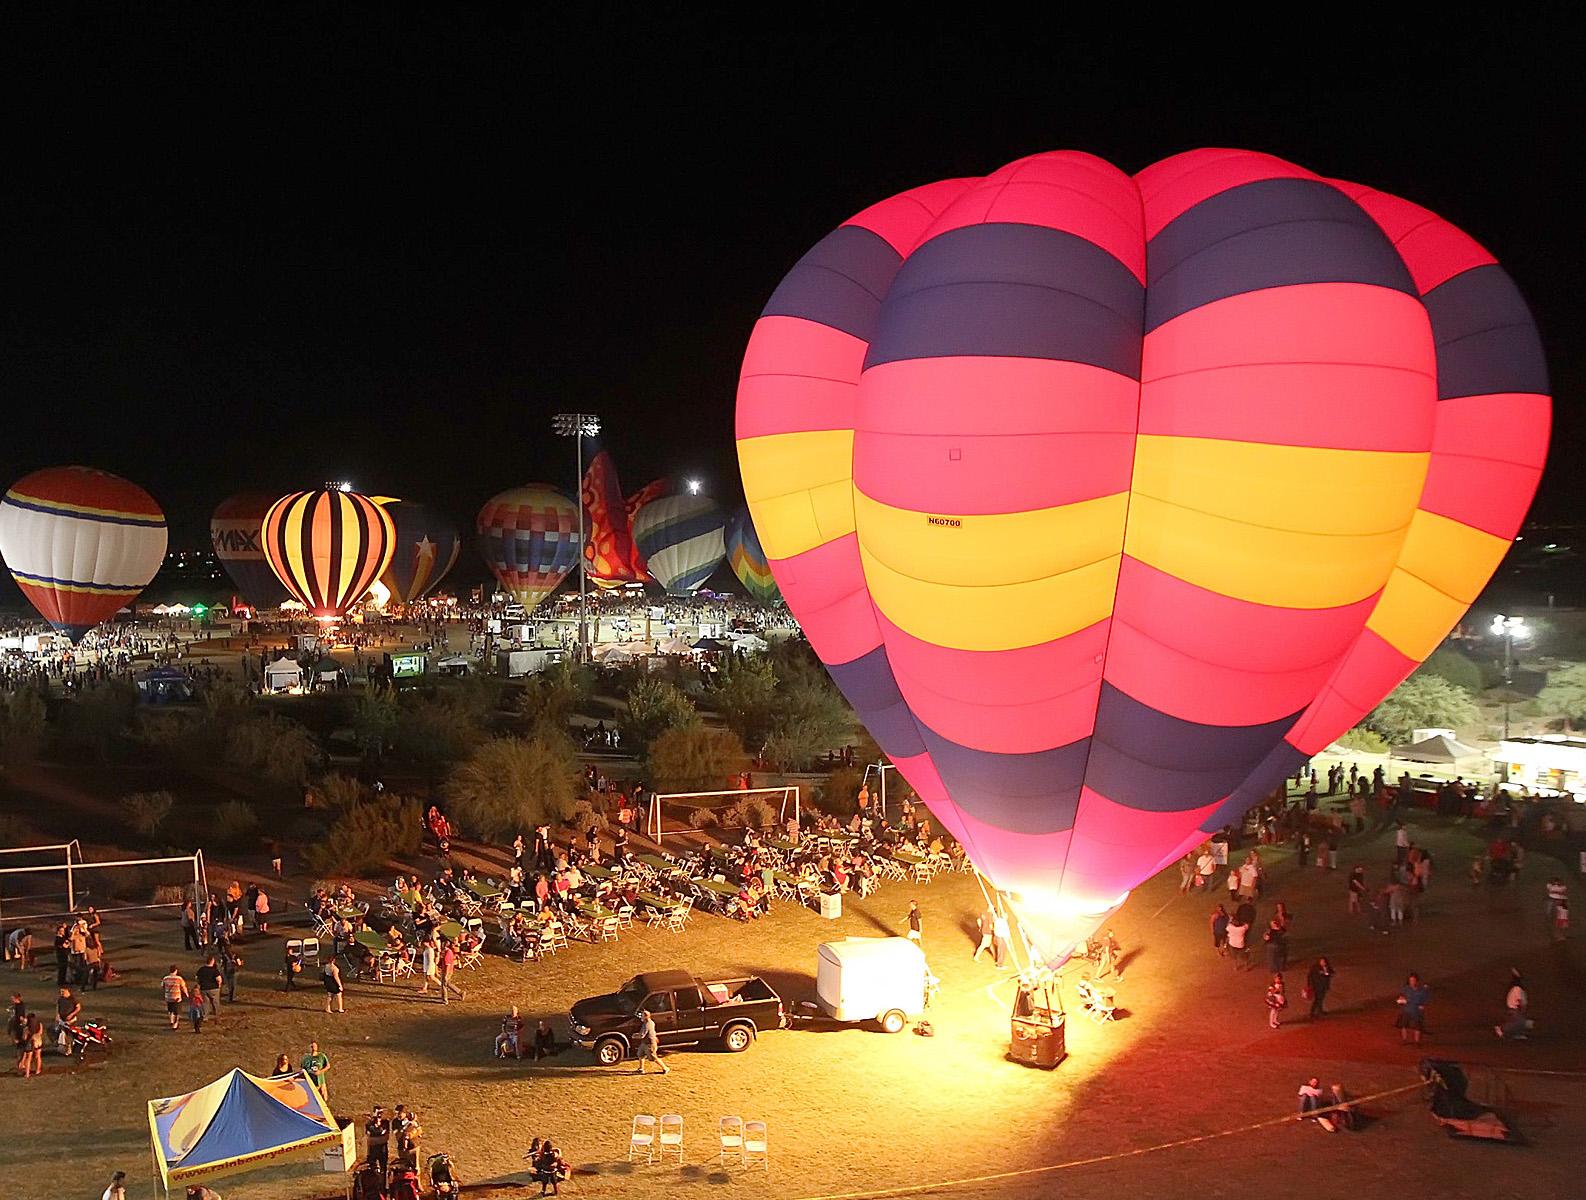 0-yp-Balloon_Airborne-YPP_4451